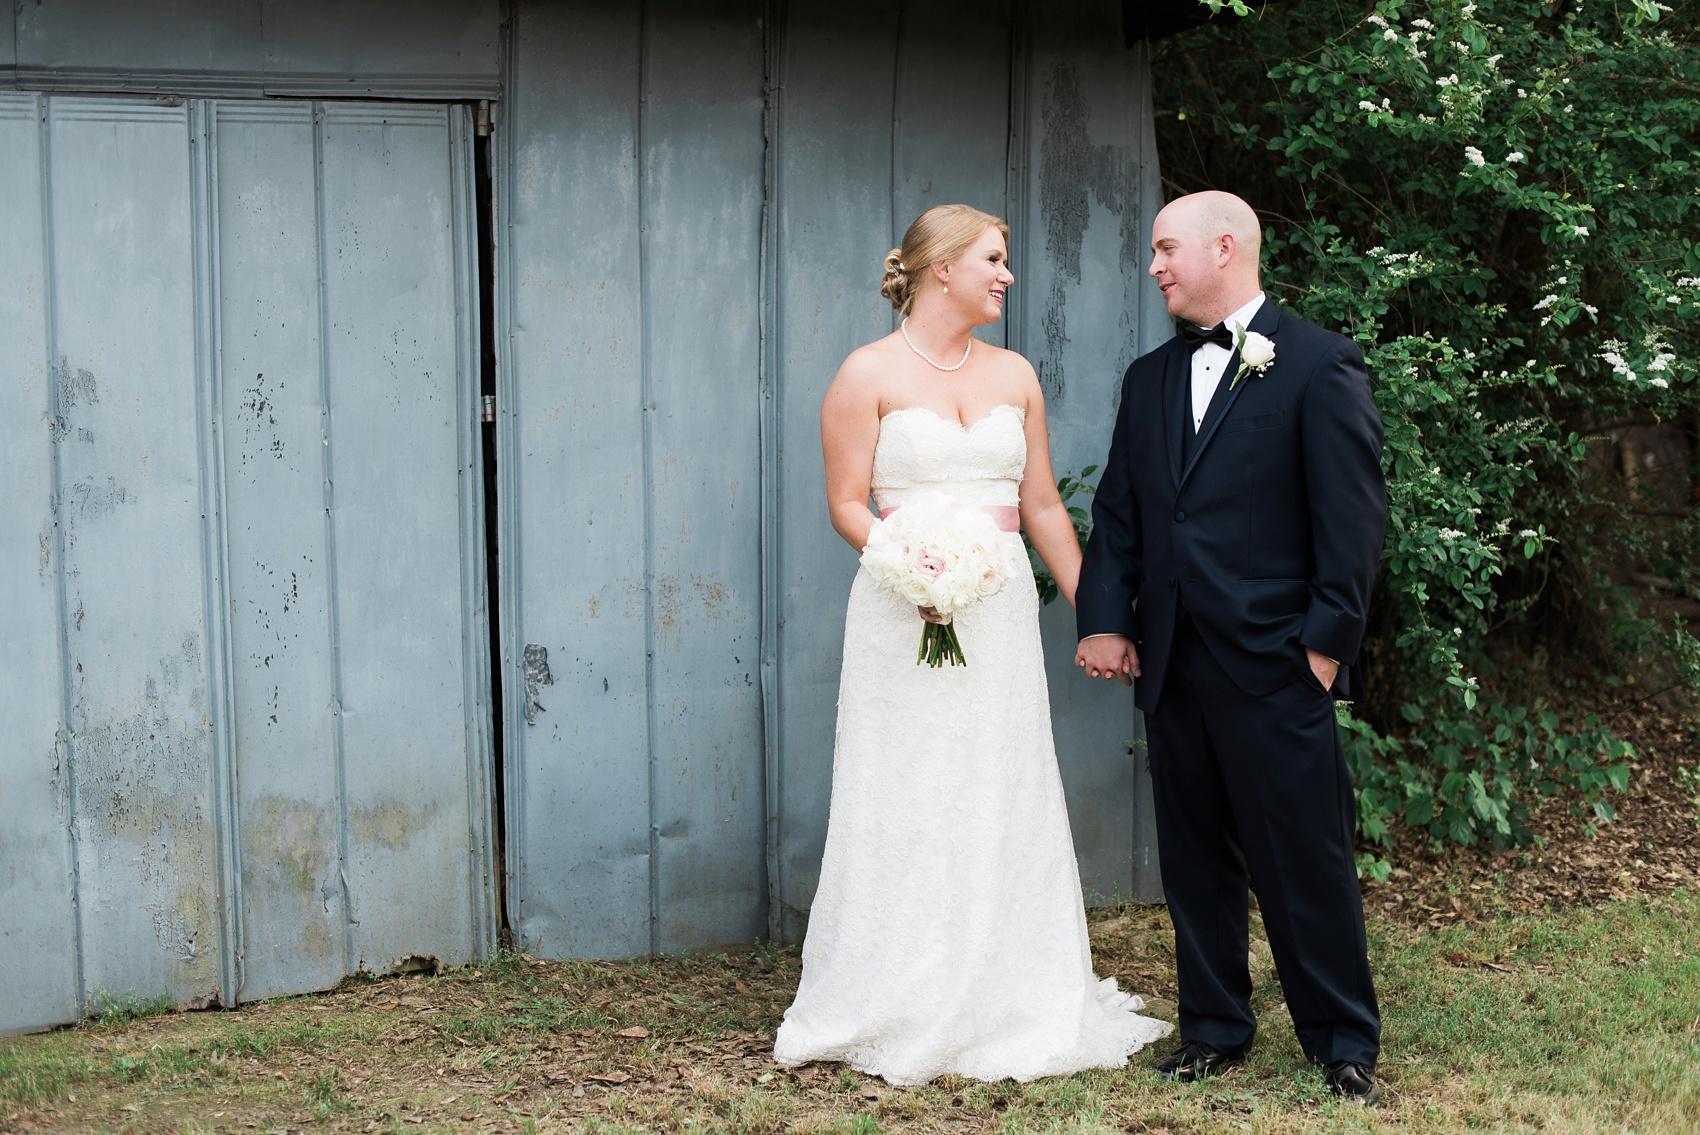 lexington_wedding_photographer_0114.jpg